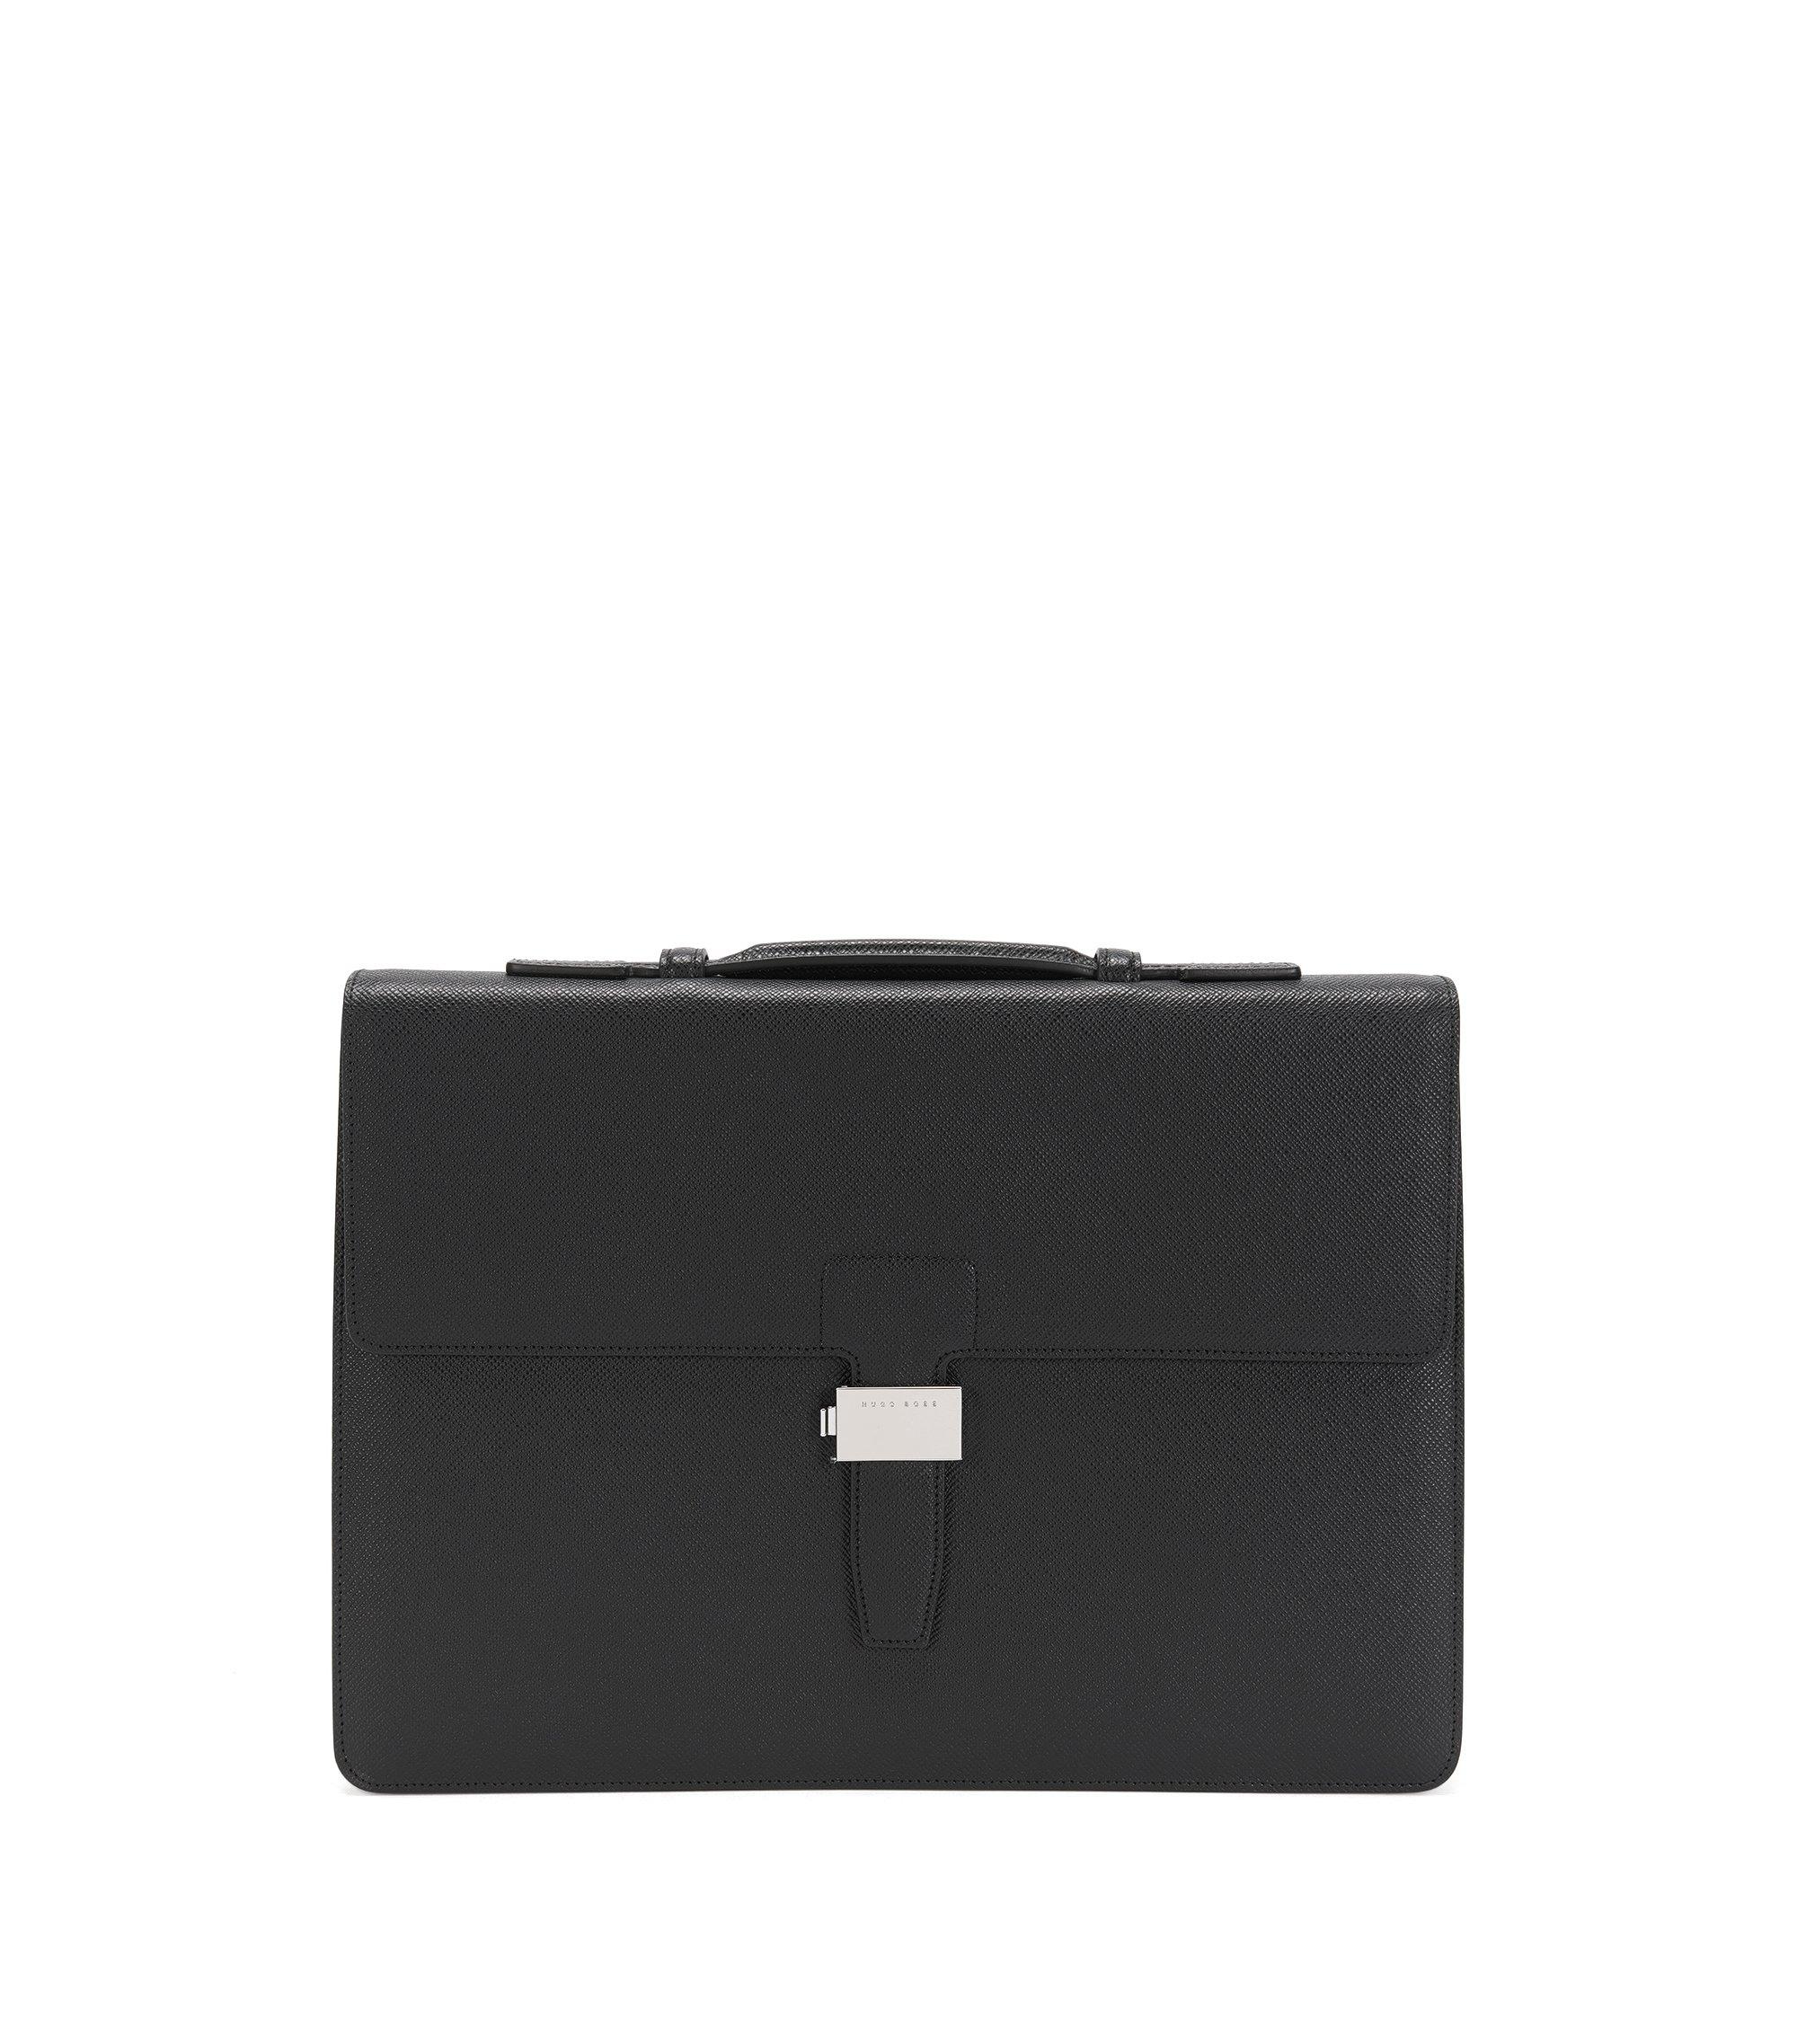 Leather Briefcase | Signature Brief SN, Black